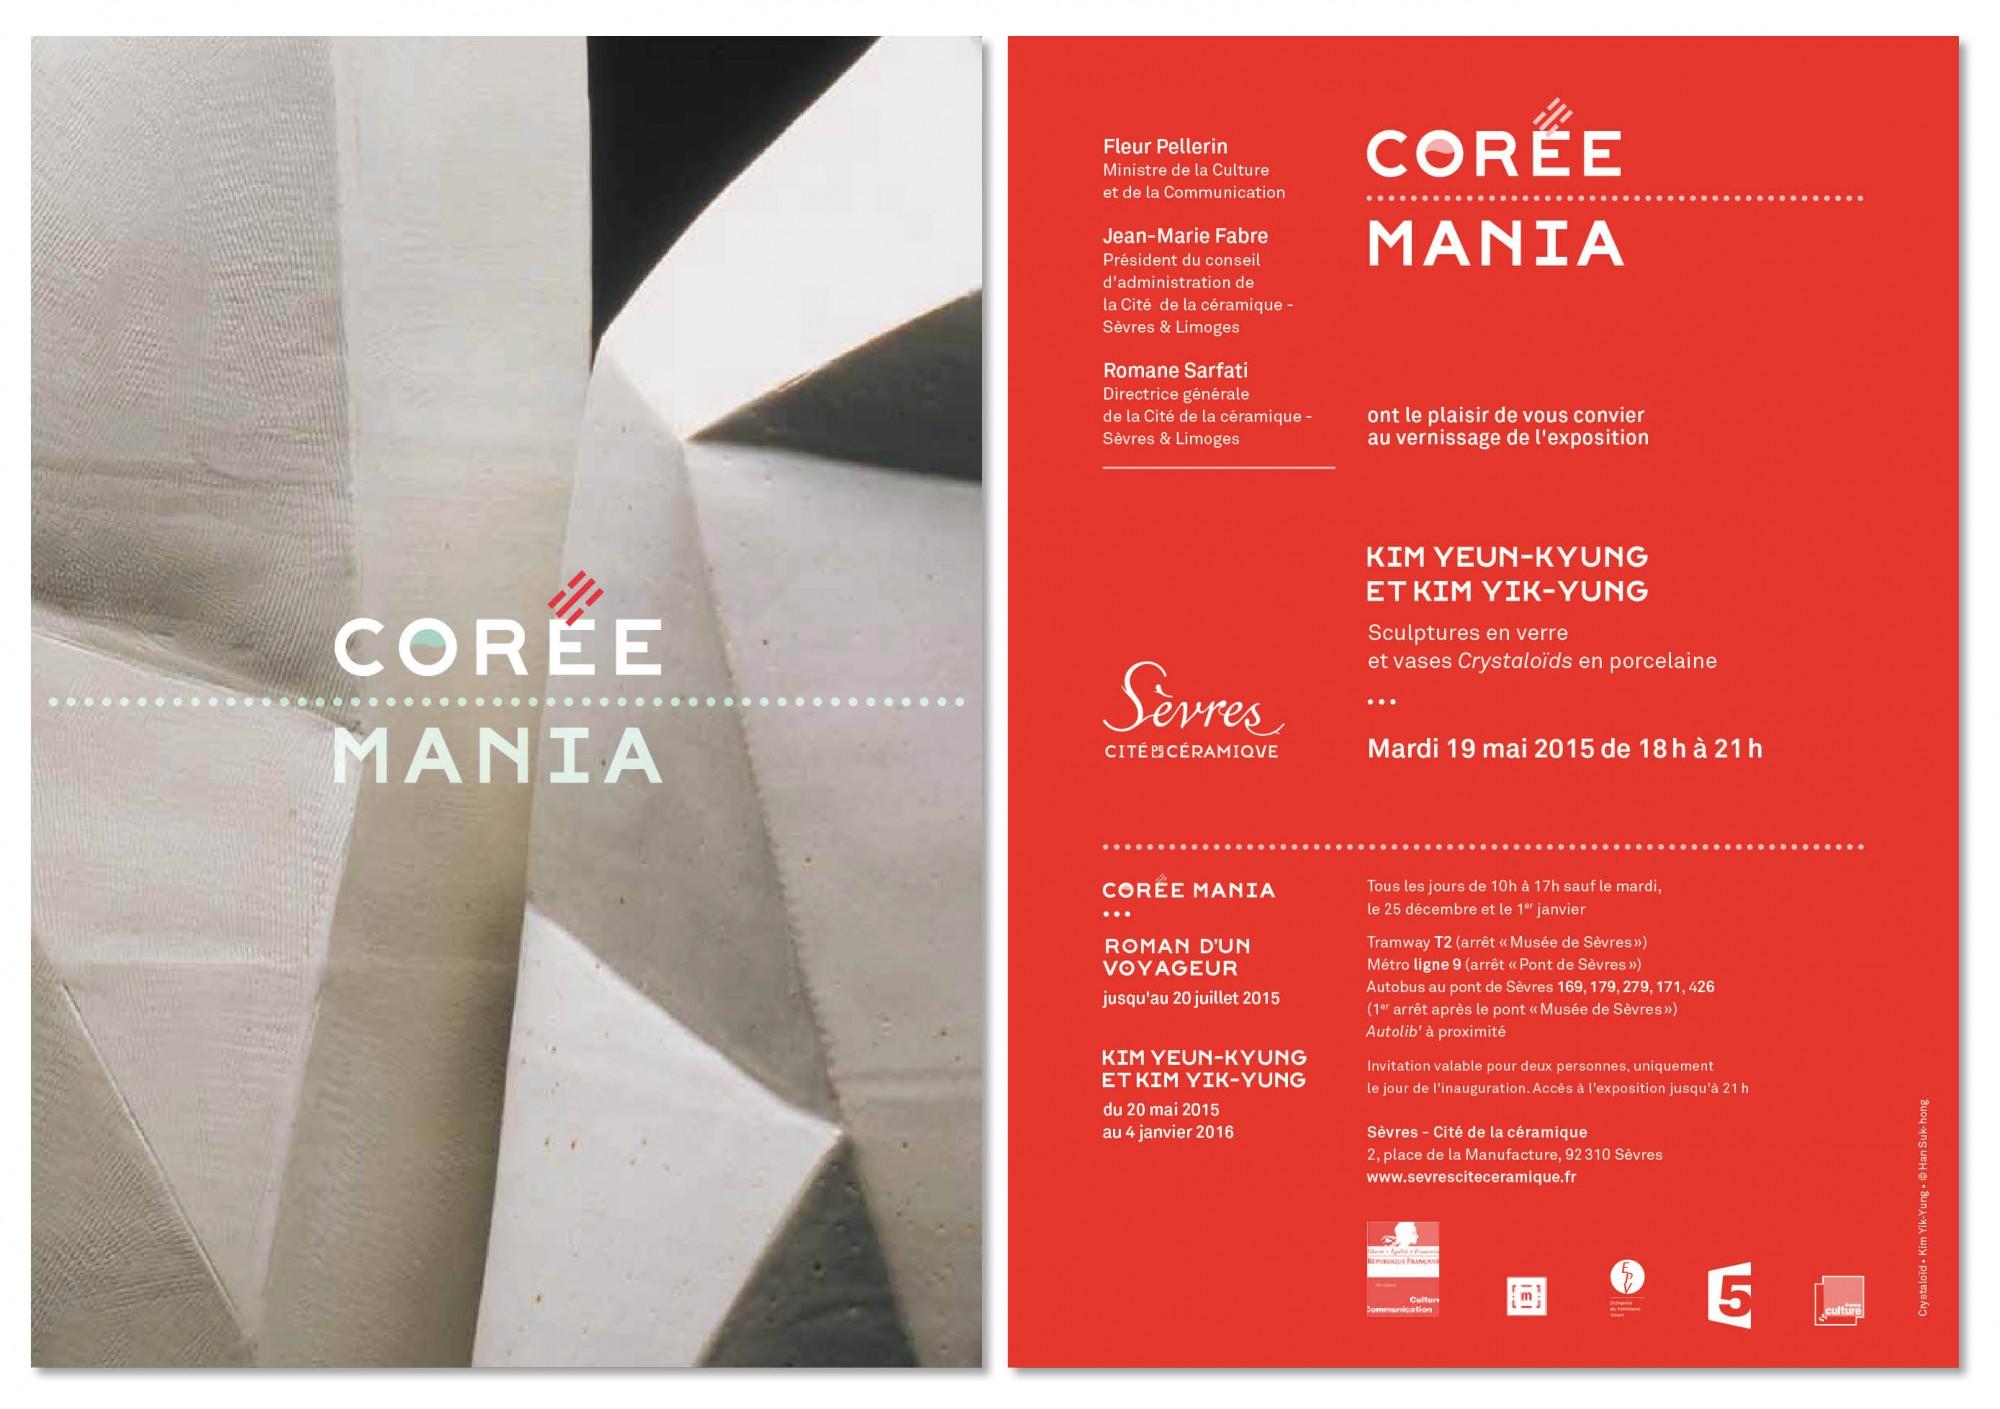 coree mania3